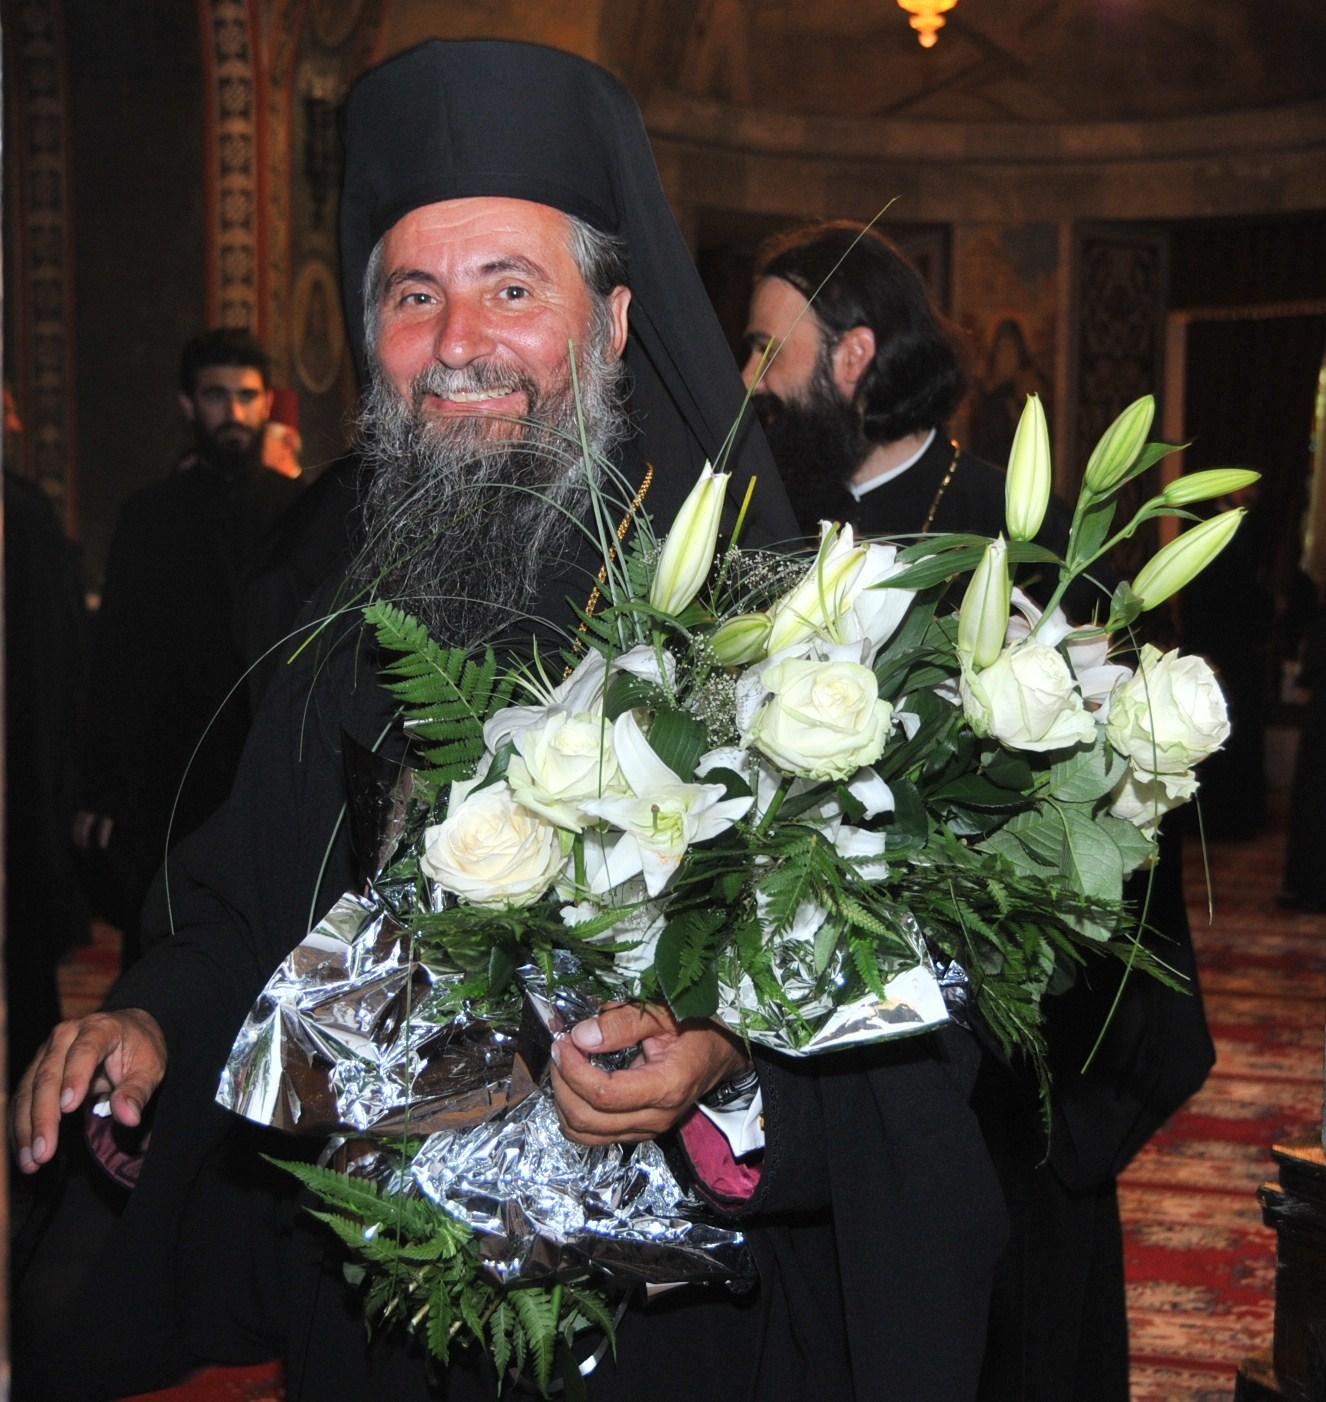 http://www.teologiepentruazi.ro/wp-content/uploads/2008/07/2.jpg